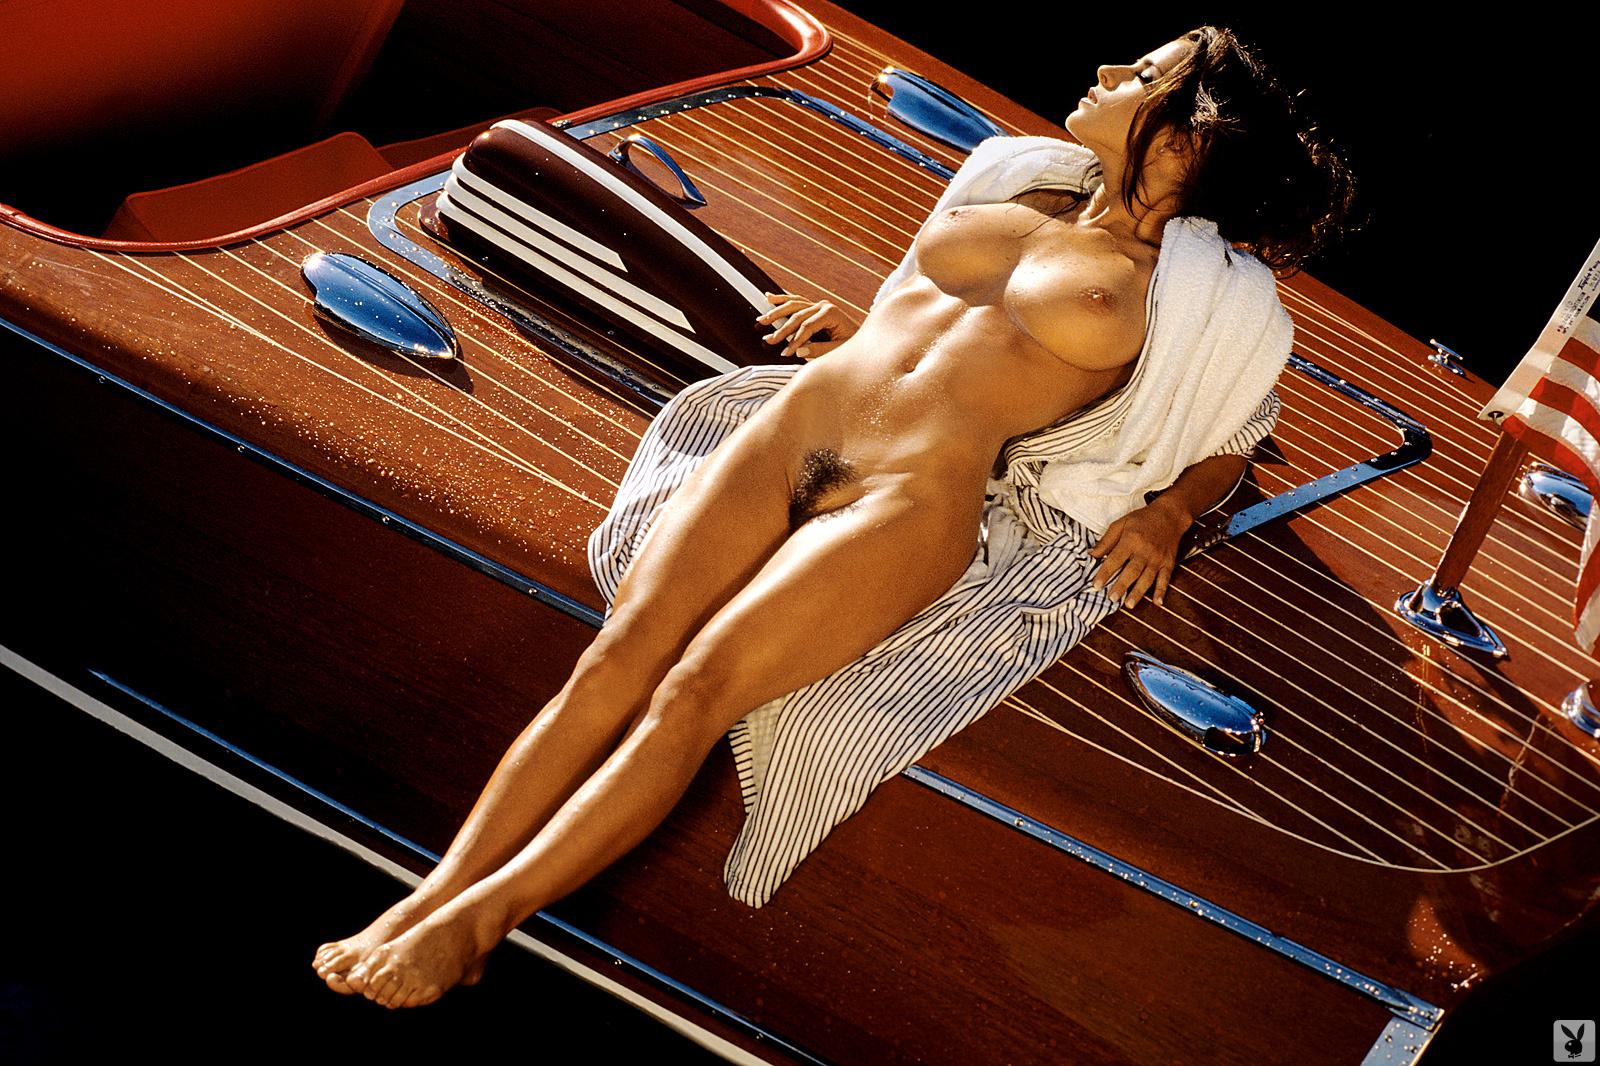 kelly-monaco-nude-lifeguard-tits-pussy-wet-playboy-10